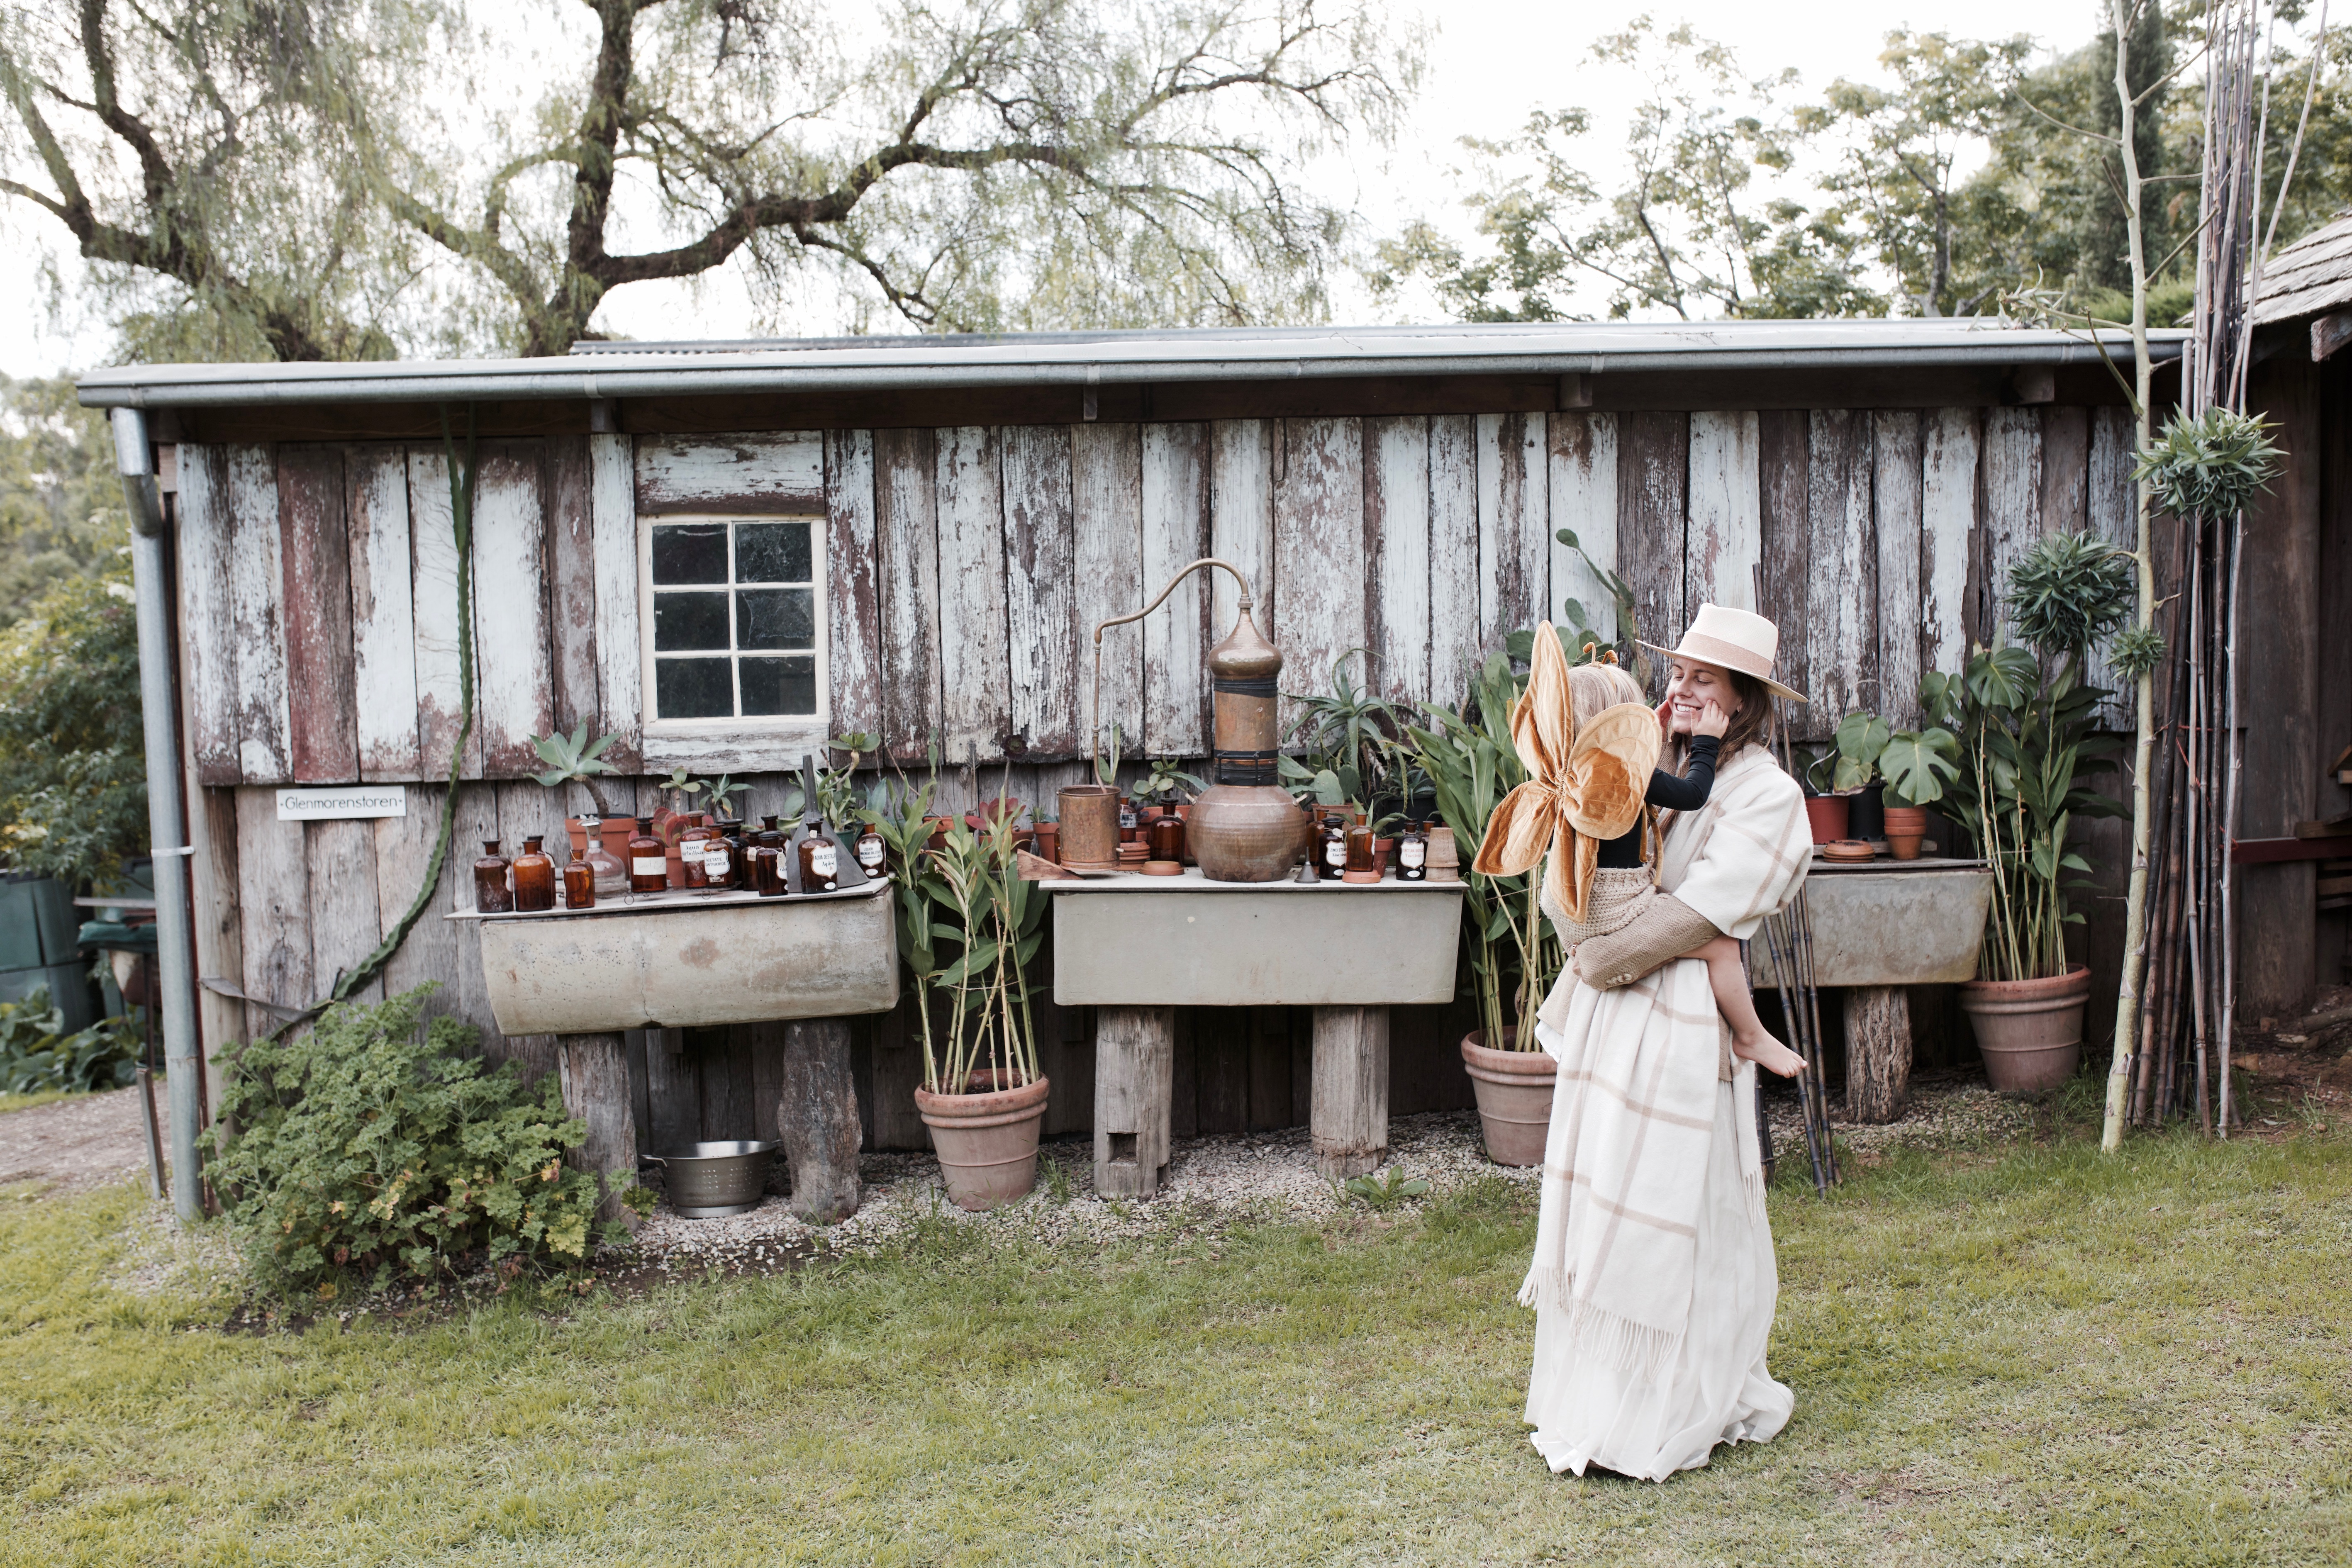 sibella court the society inc nomad treasure hunter garden alchemist the scent seeker captain and the gypsy kid catgk